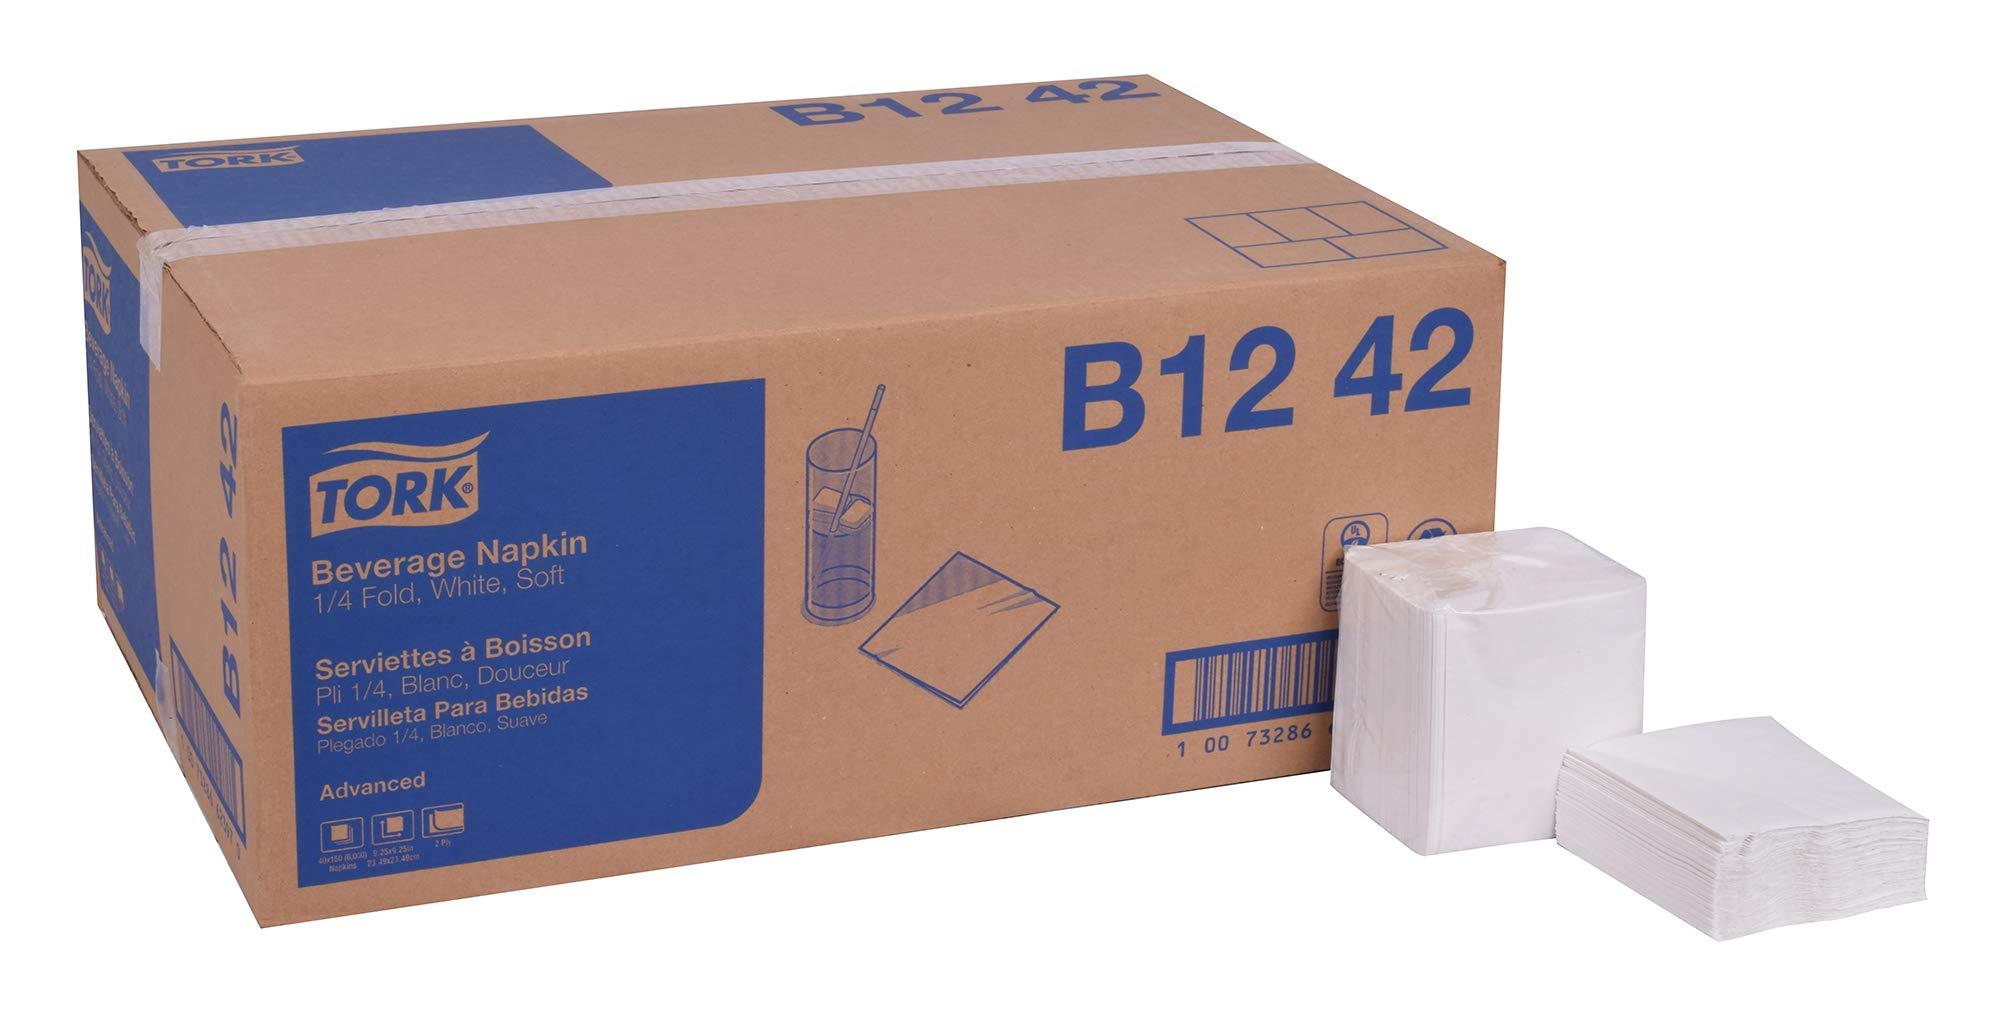 Tork Advanced B1242 Soft Beverage Napkin, Key Embossed, 2-Ply, 1/4 Fold, 9.25'' Length x 9.25'' Width, White (Case of 40 Packs, 150 per Pack, 6,000 Napkins)